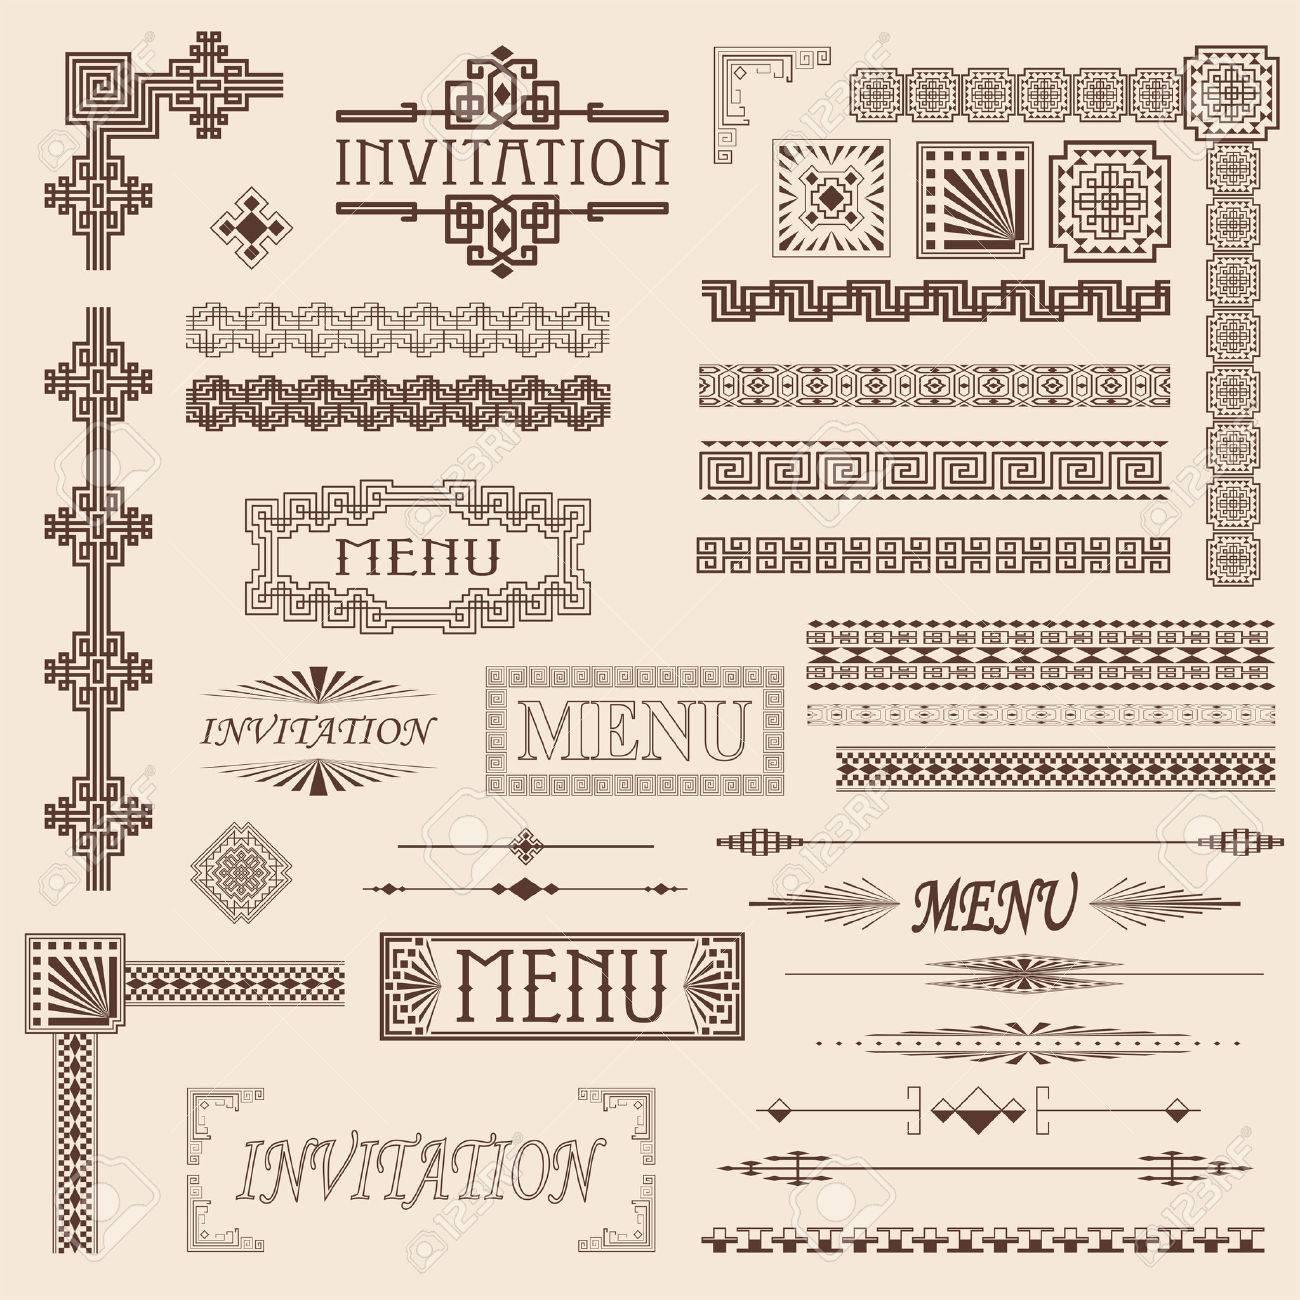 Decorative menu and invitation border elements Stock Vector - 8984758